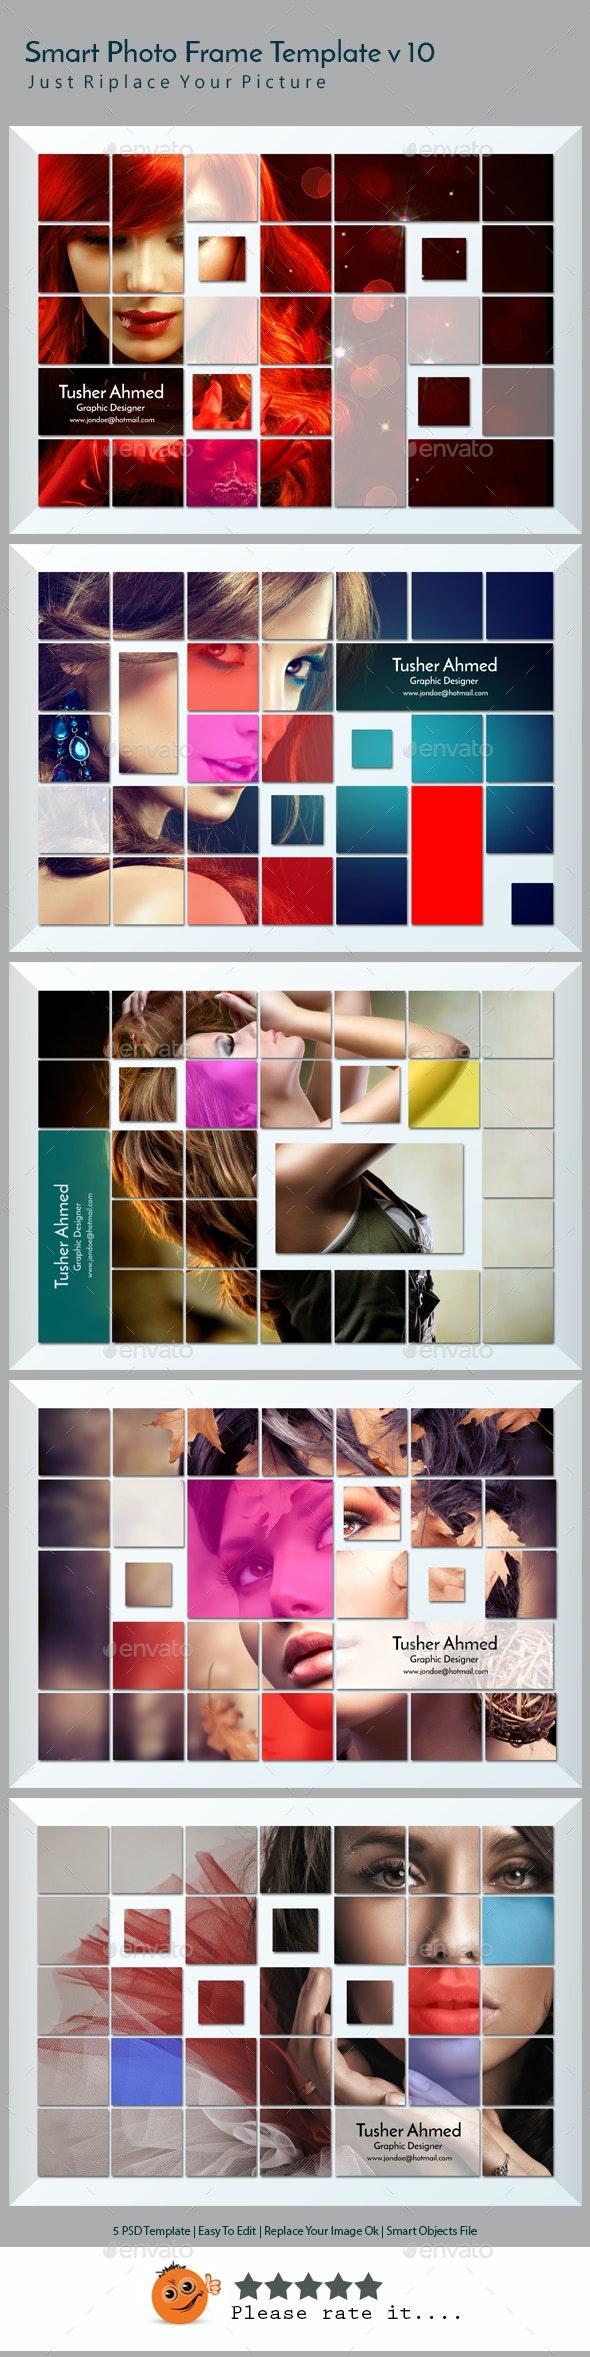 Smart Photo Frame Template v10 - Photo Templates Graphics